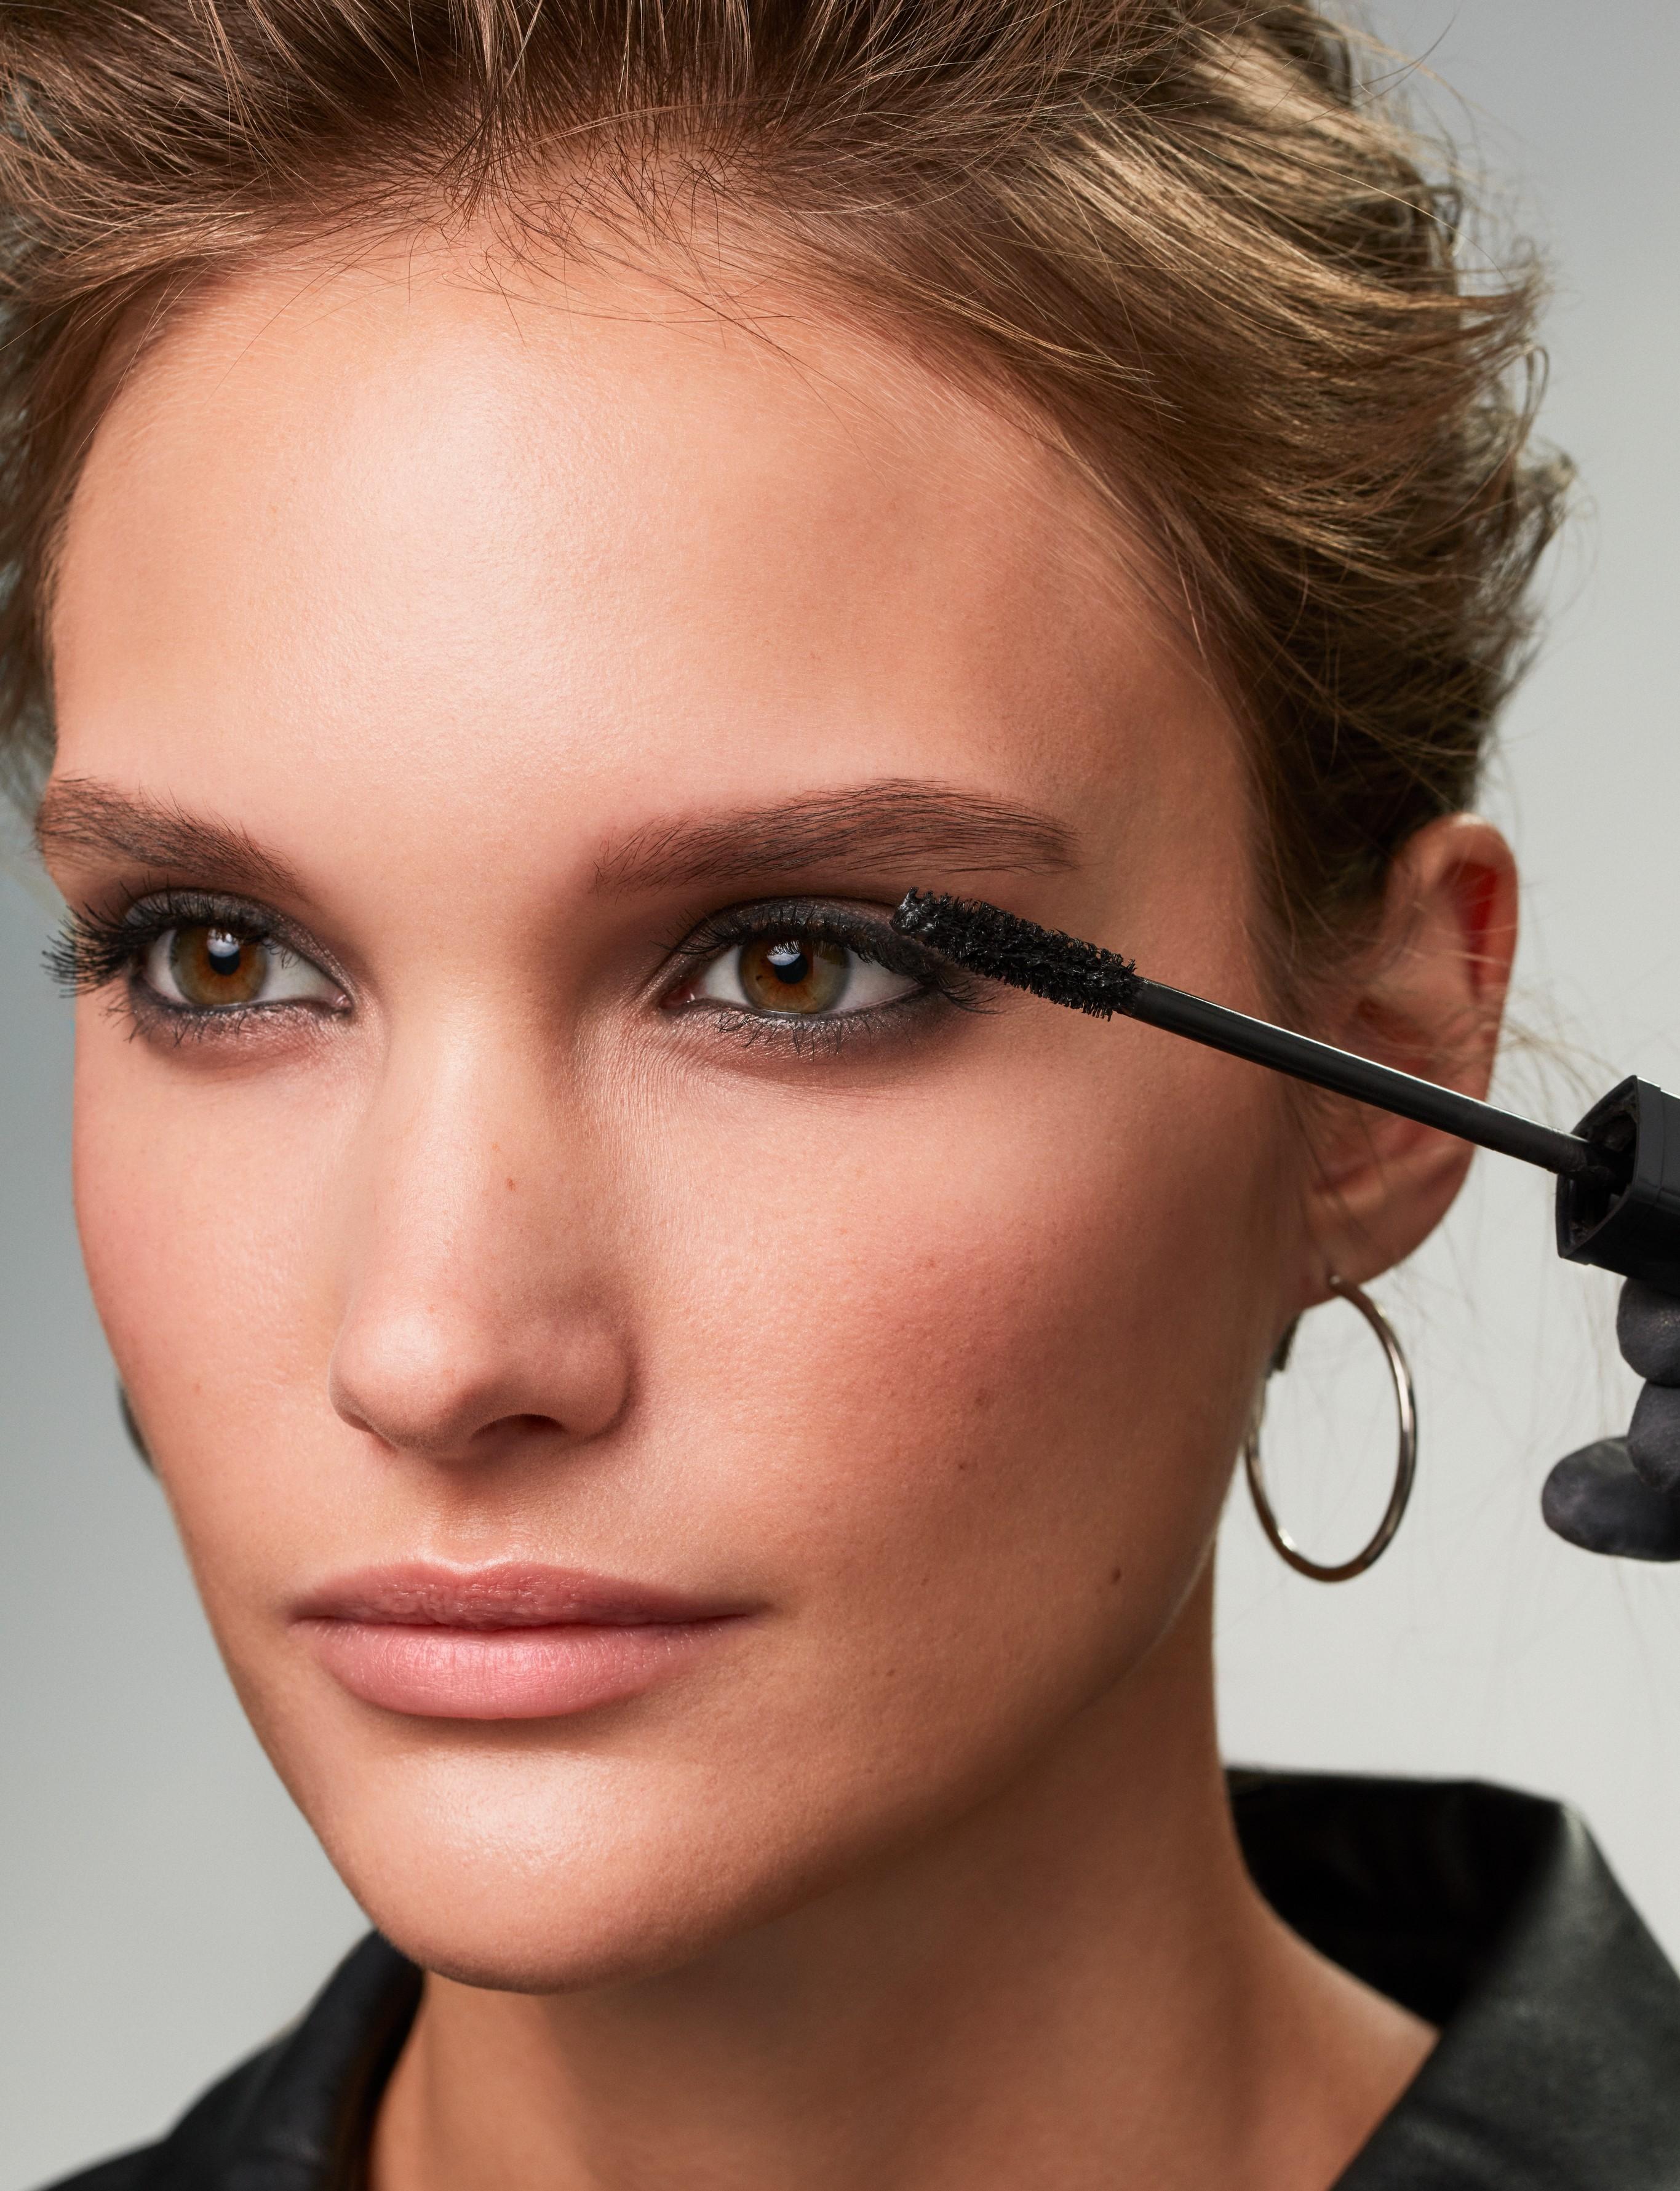 Makeup-application-5-smokey-eyes-062023-Web-Rendition